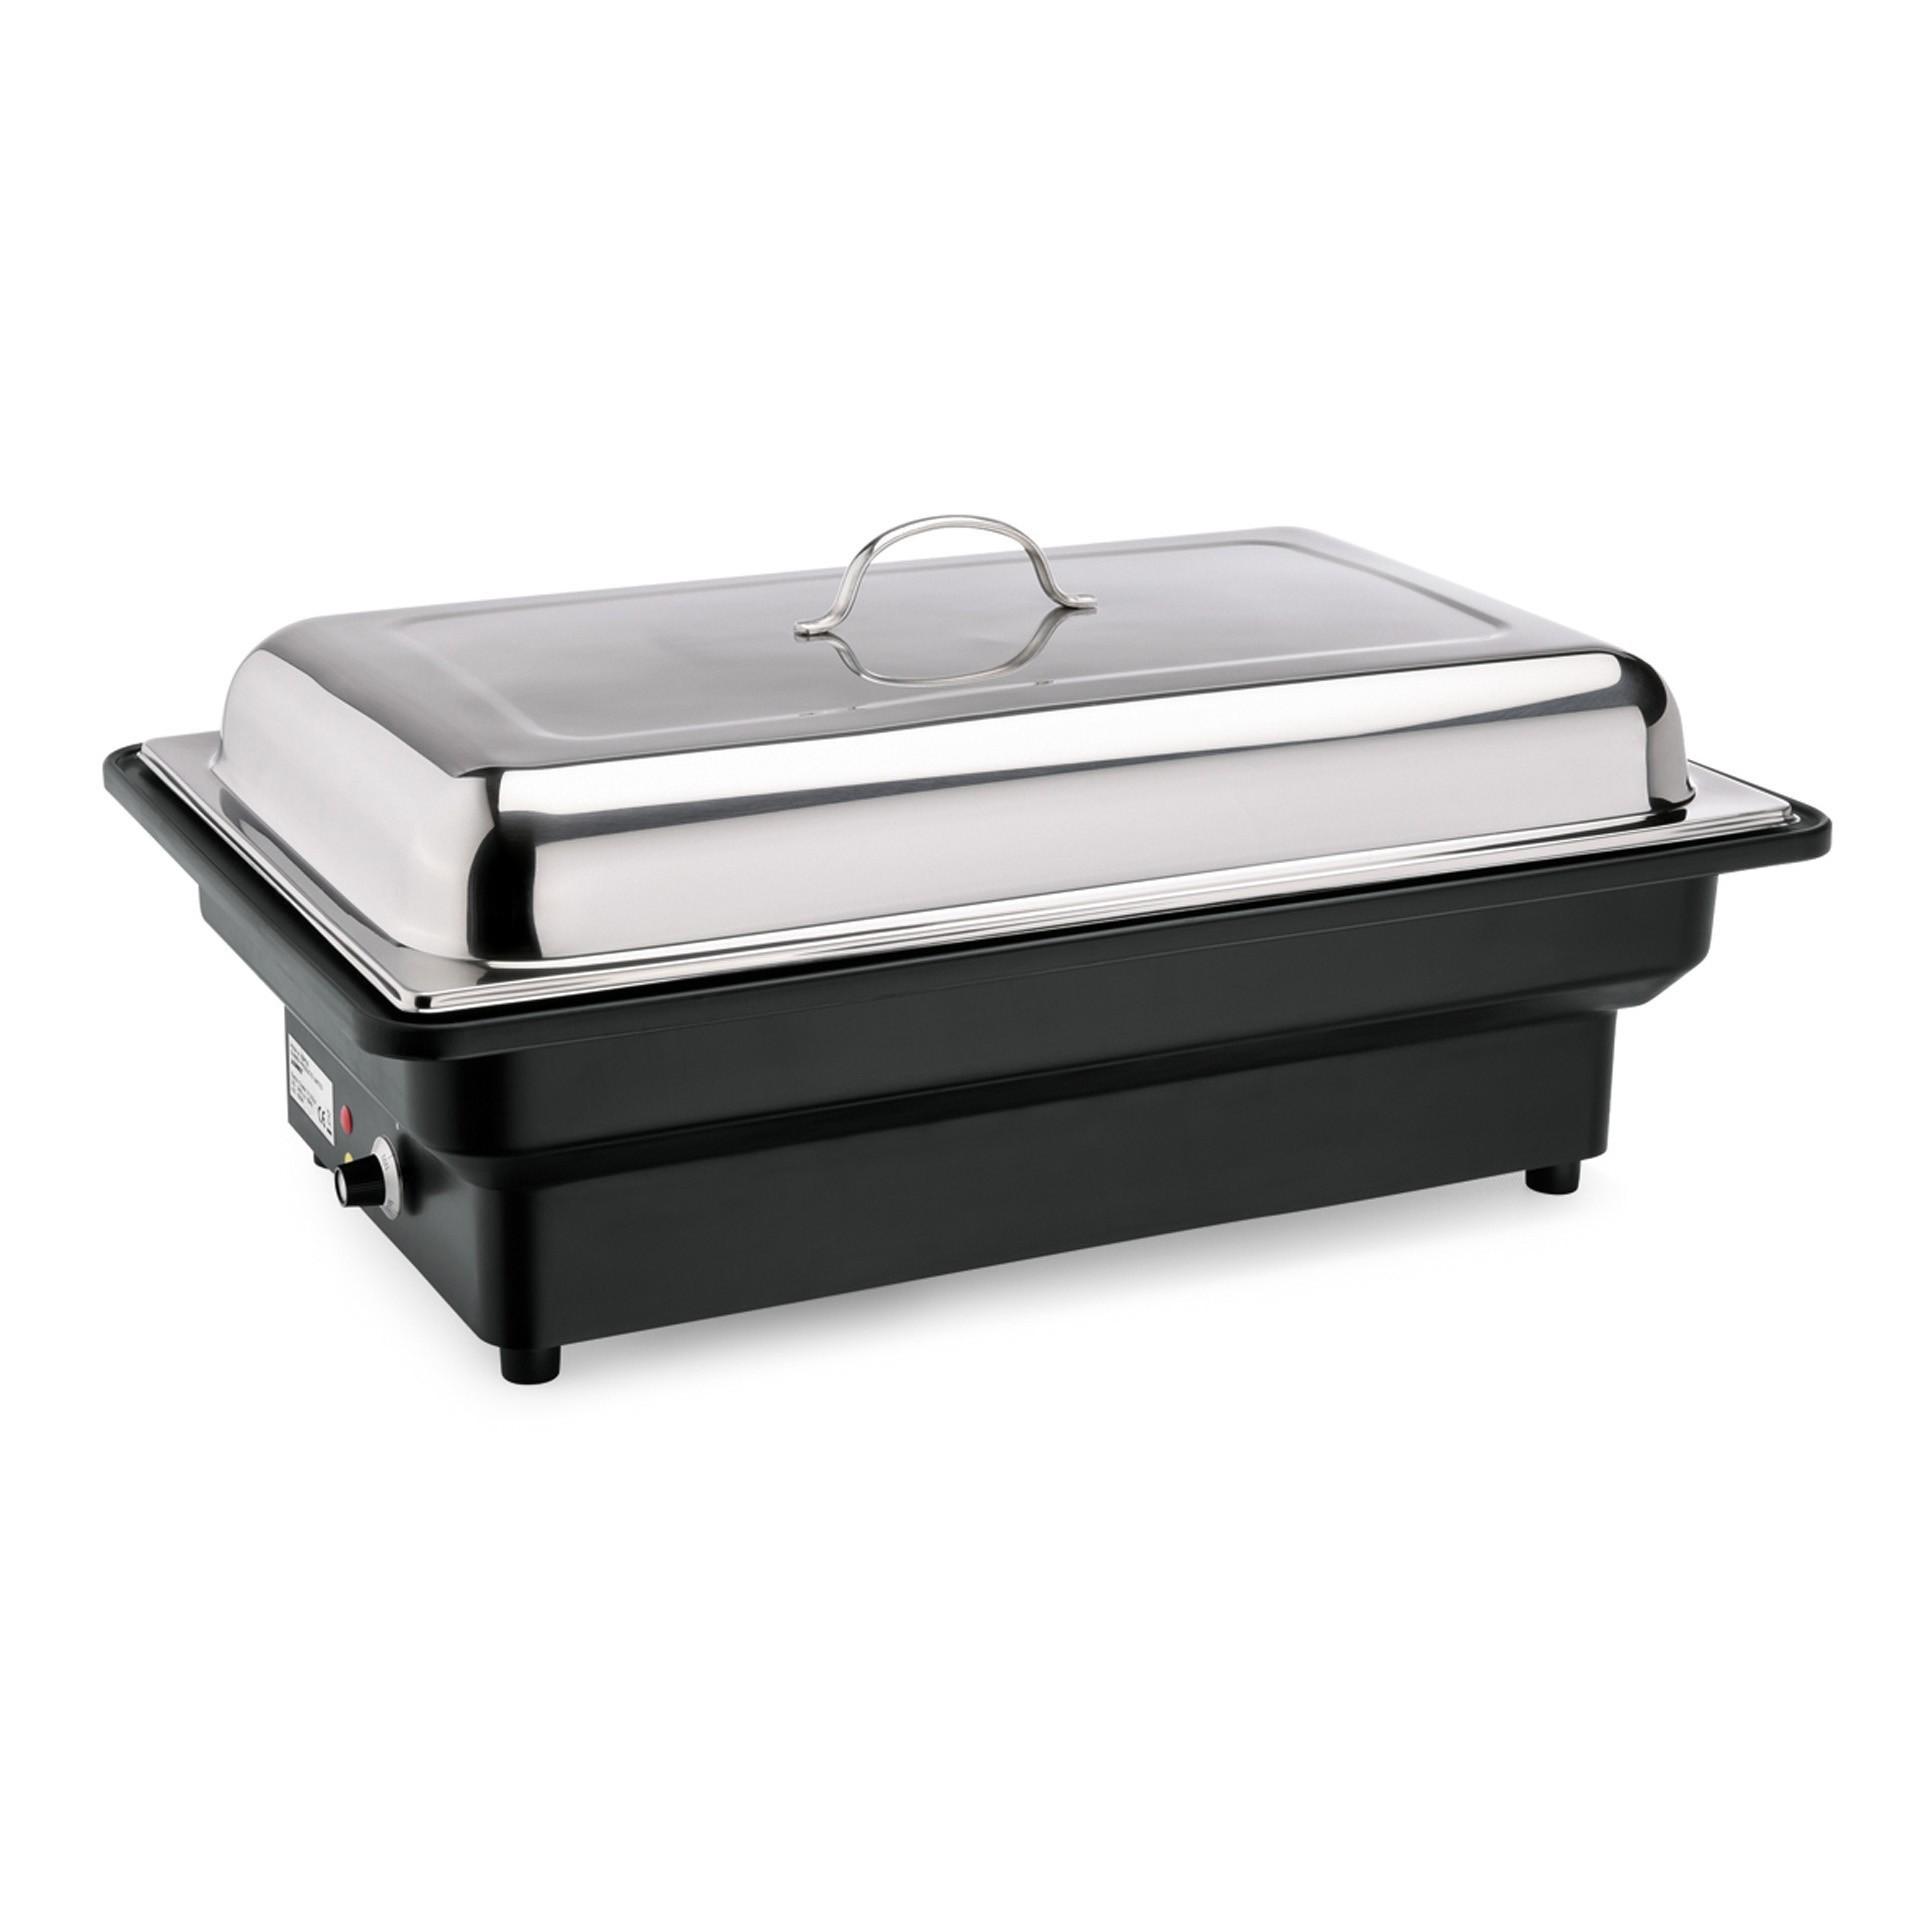 elektro chafing dish g nstig mit regelthermostat kaufen. Black Bedroom Furniture Sets. Home Design Ideas